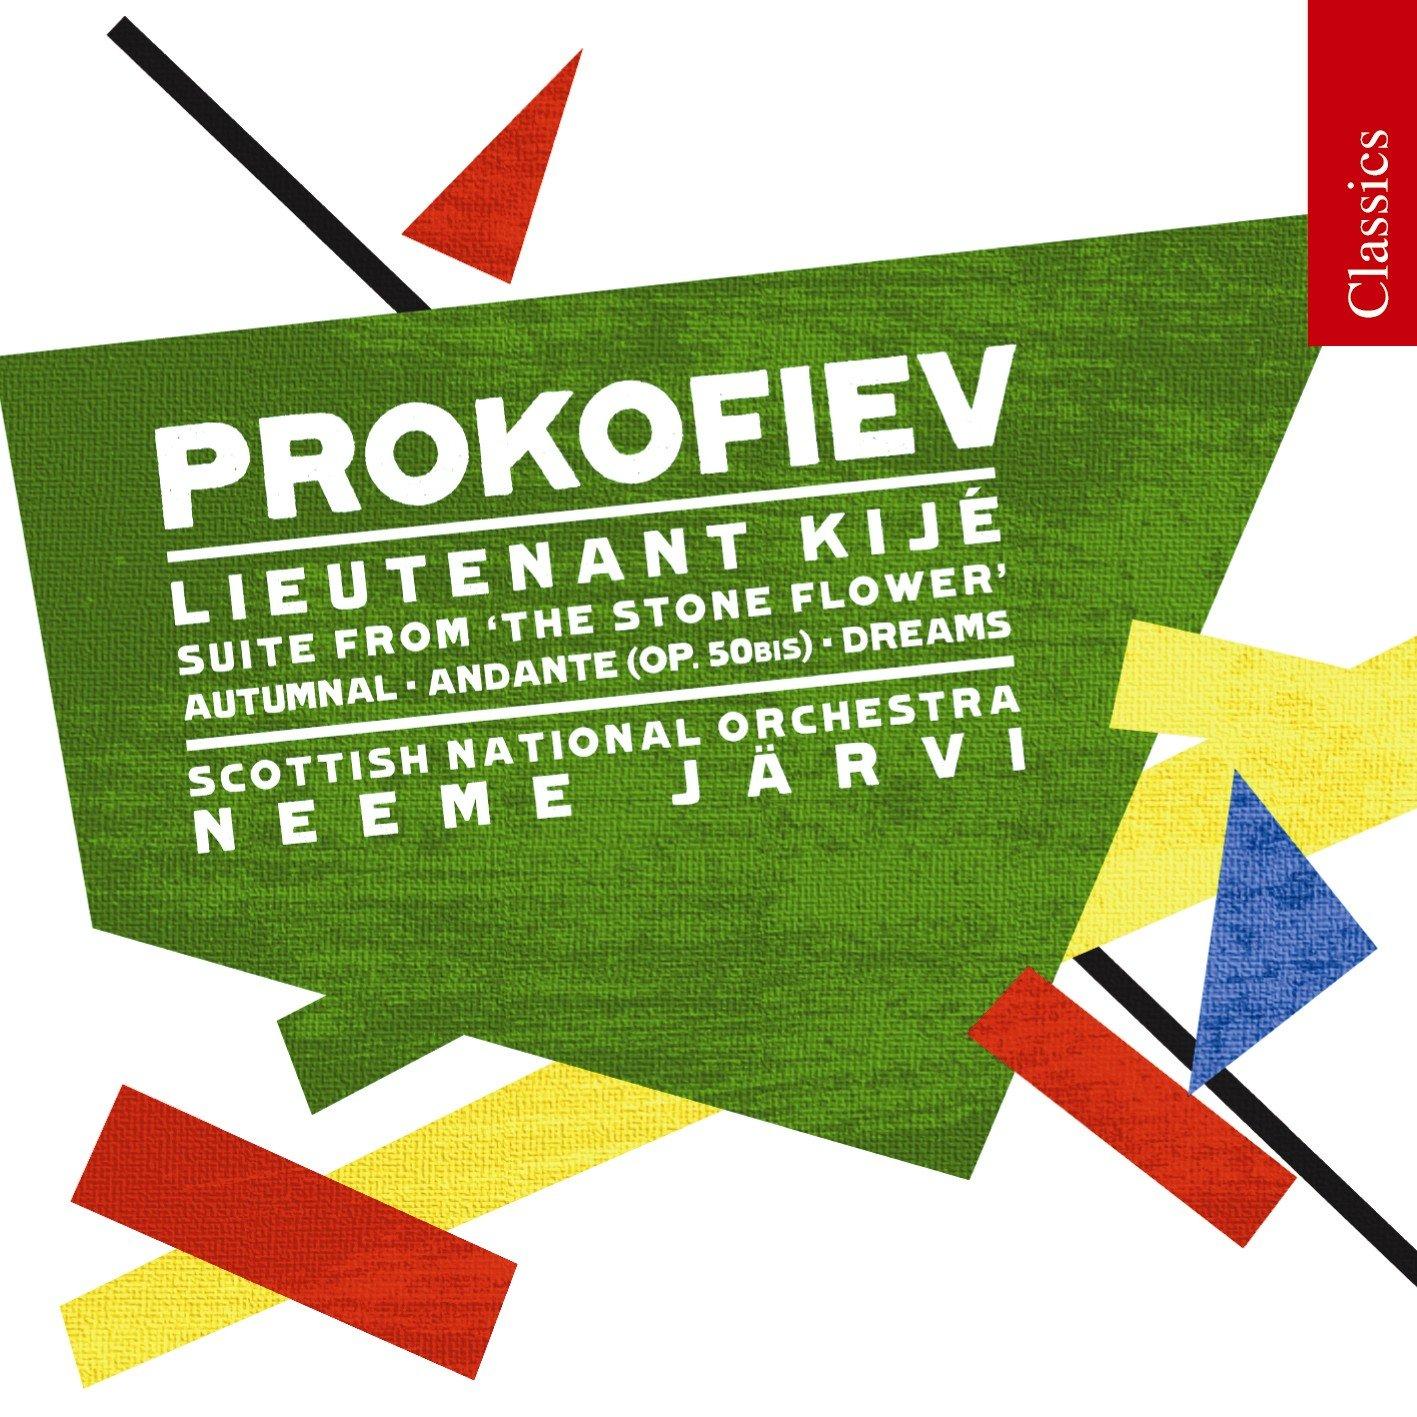 Image result for lt kije album cover